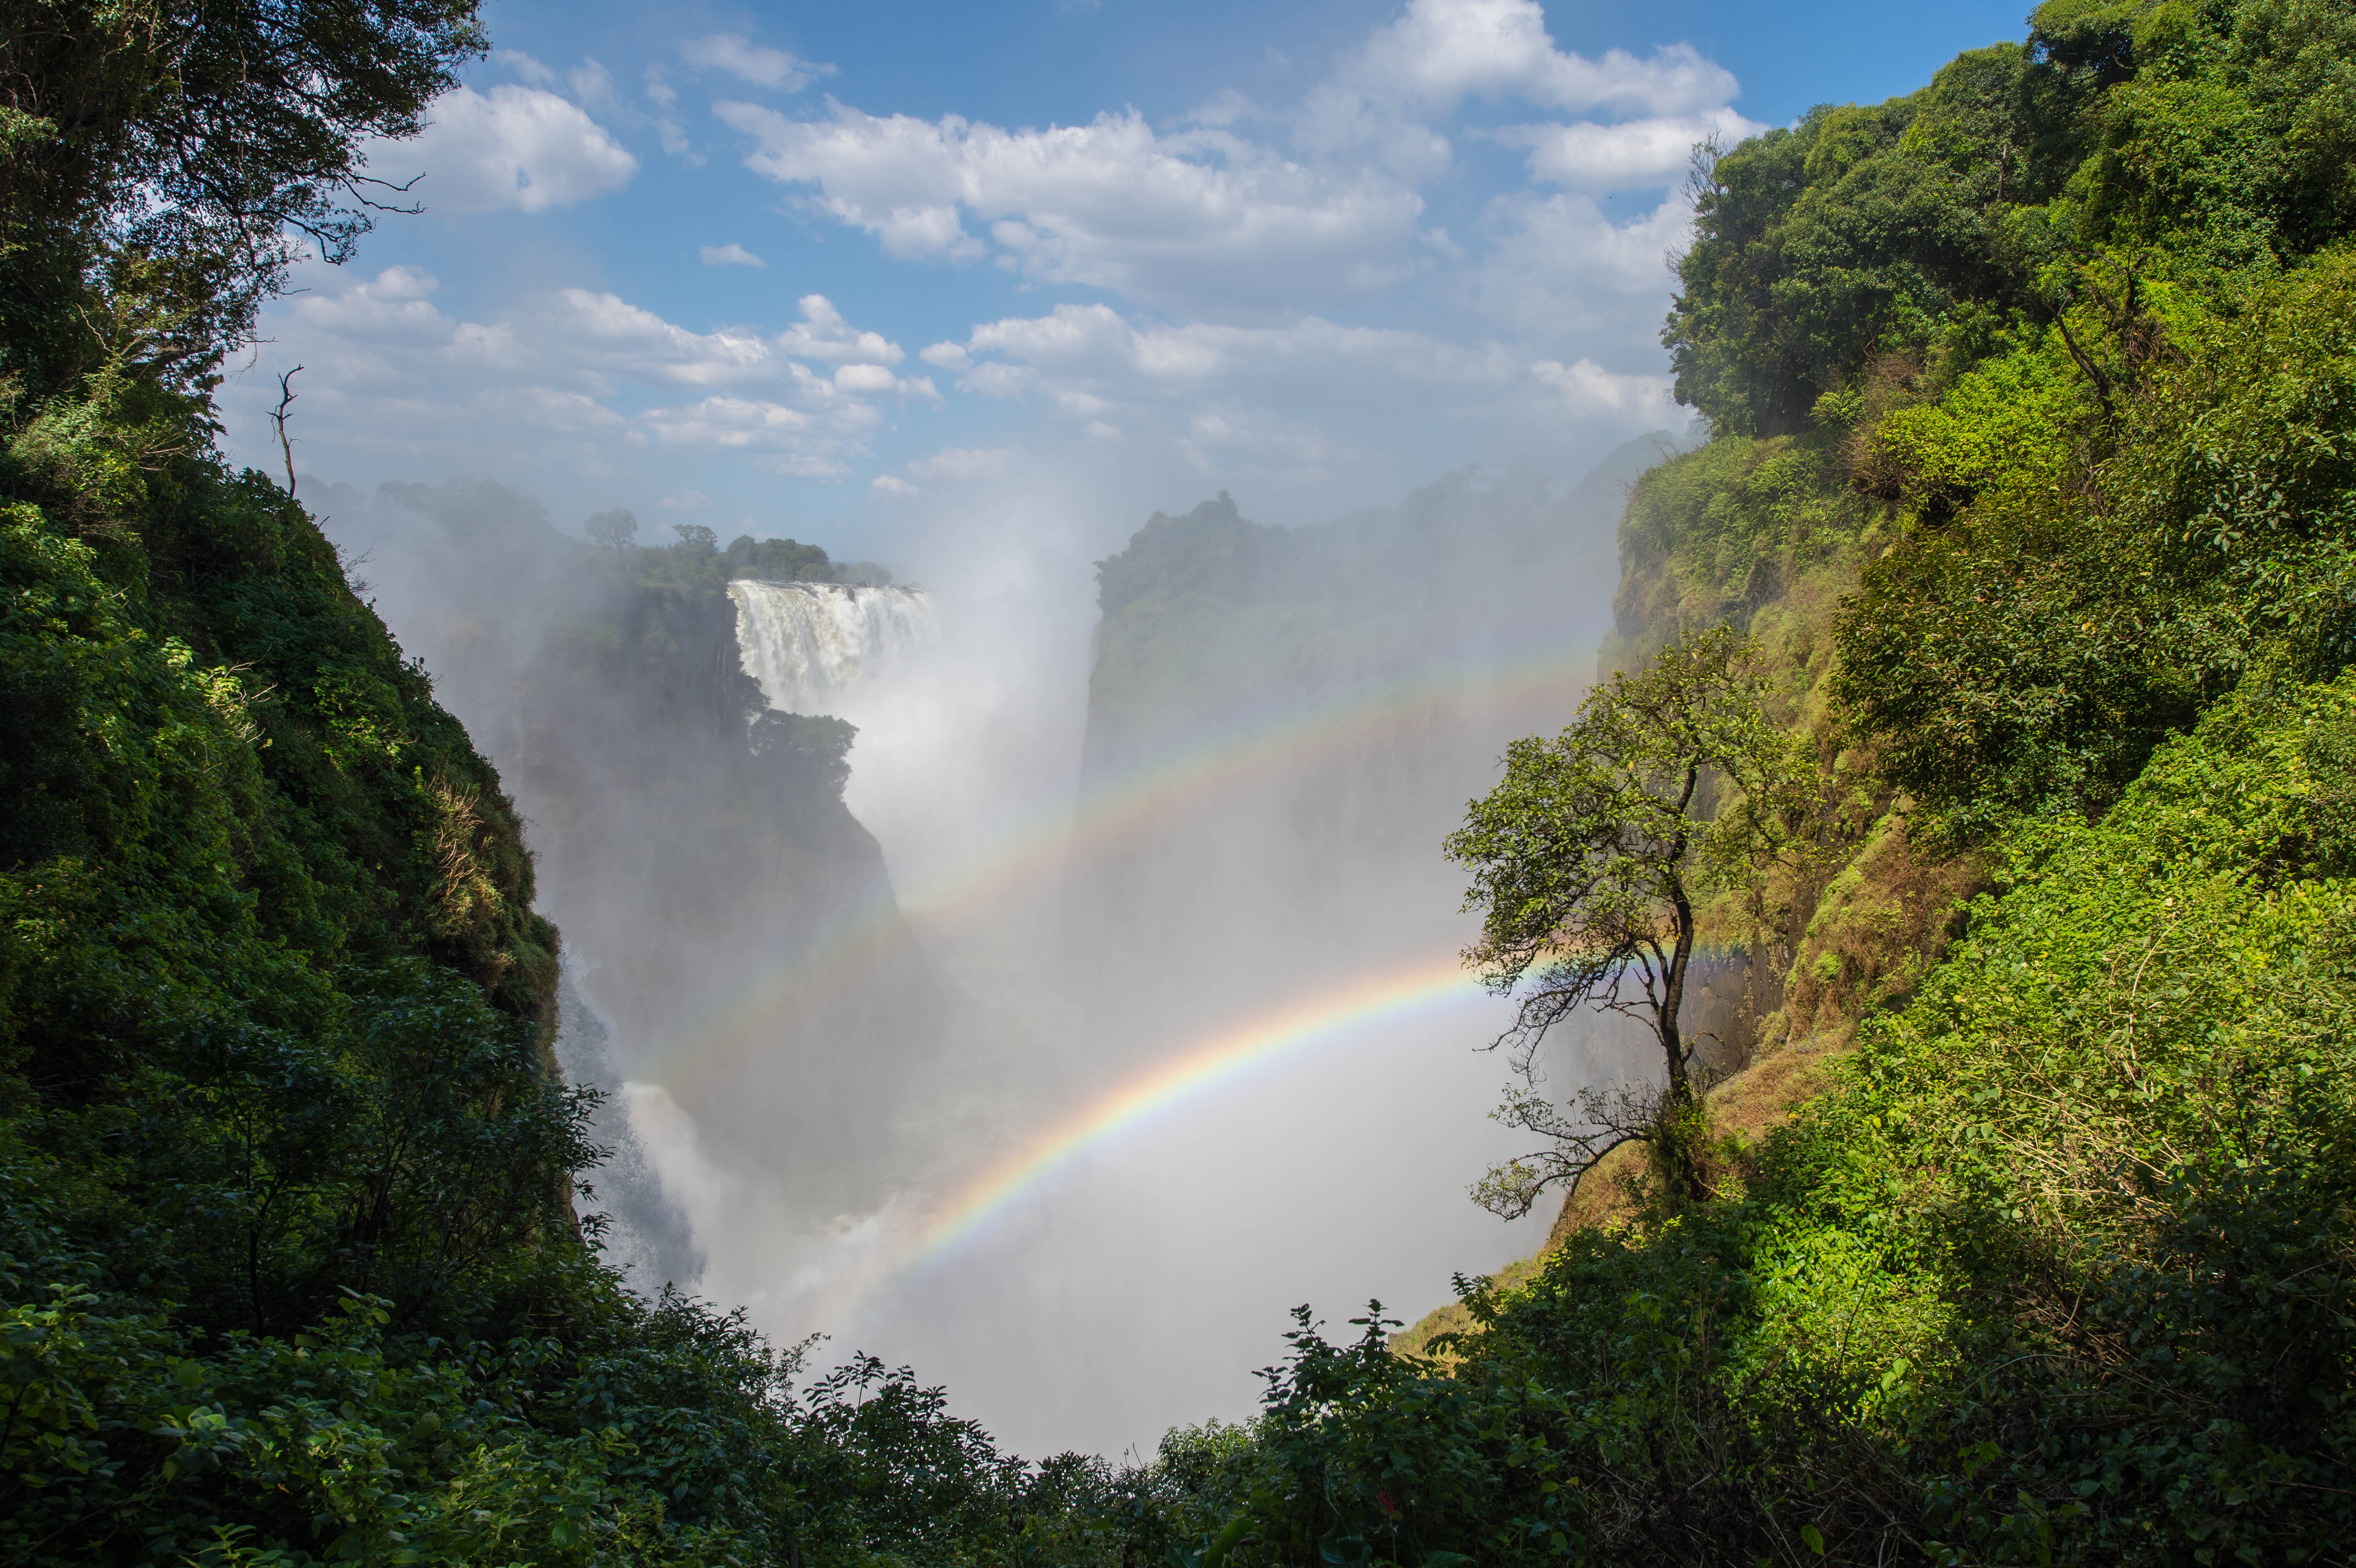 ZIMBABWE & BOTSWANA CAMPING SAFARI